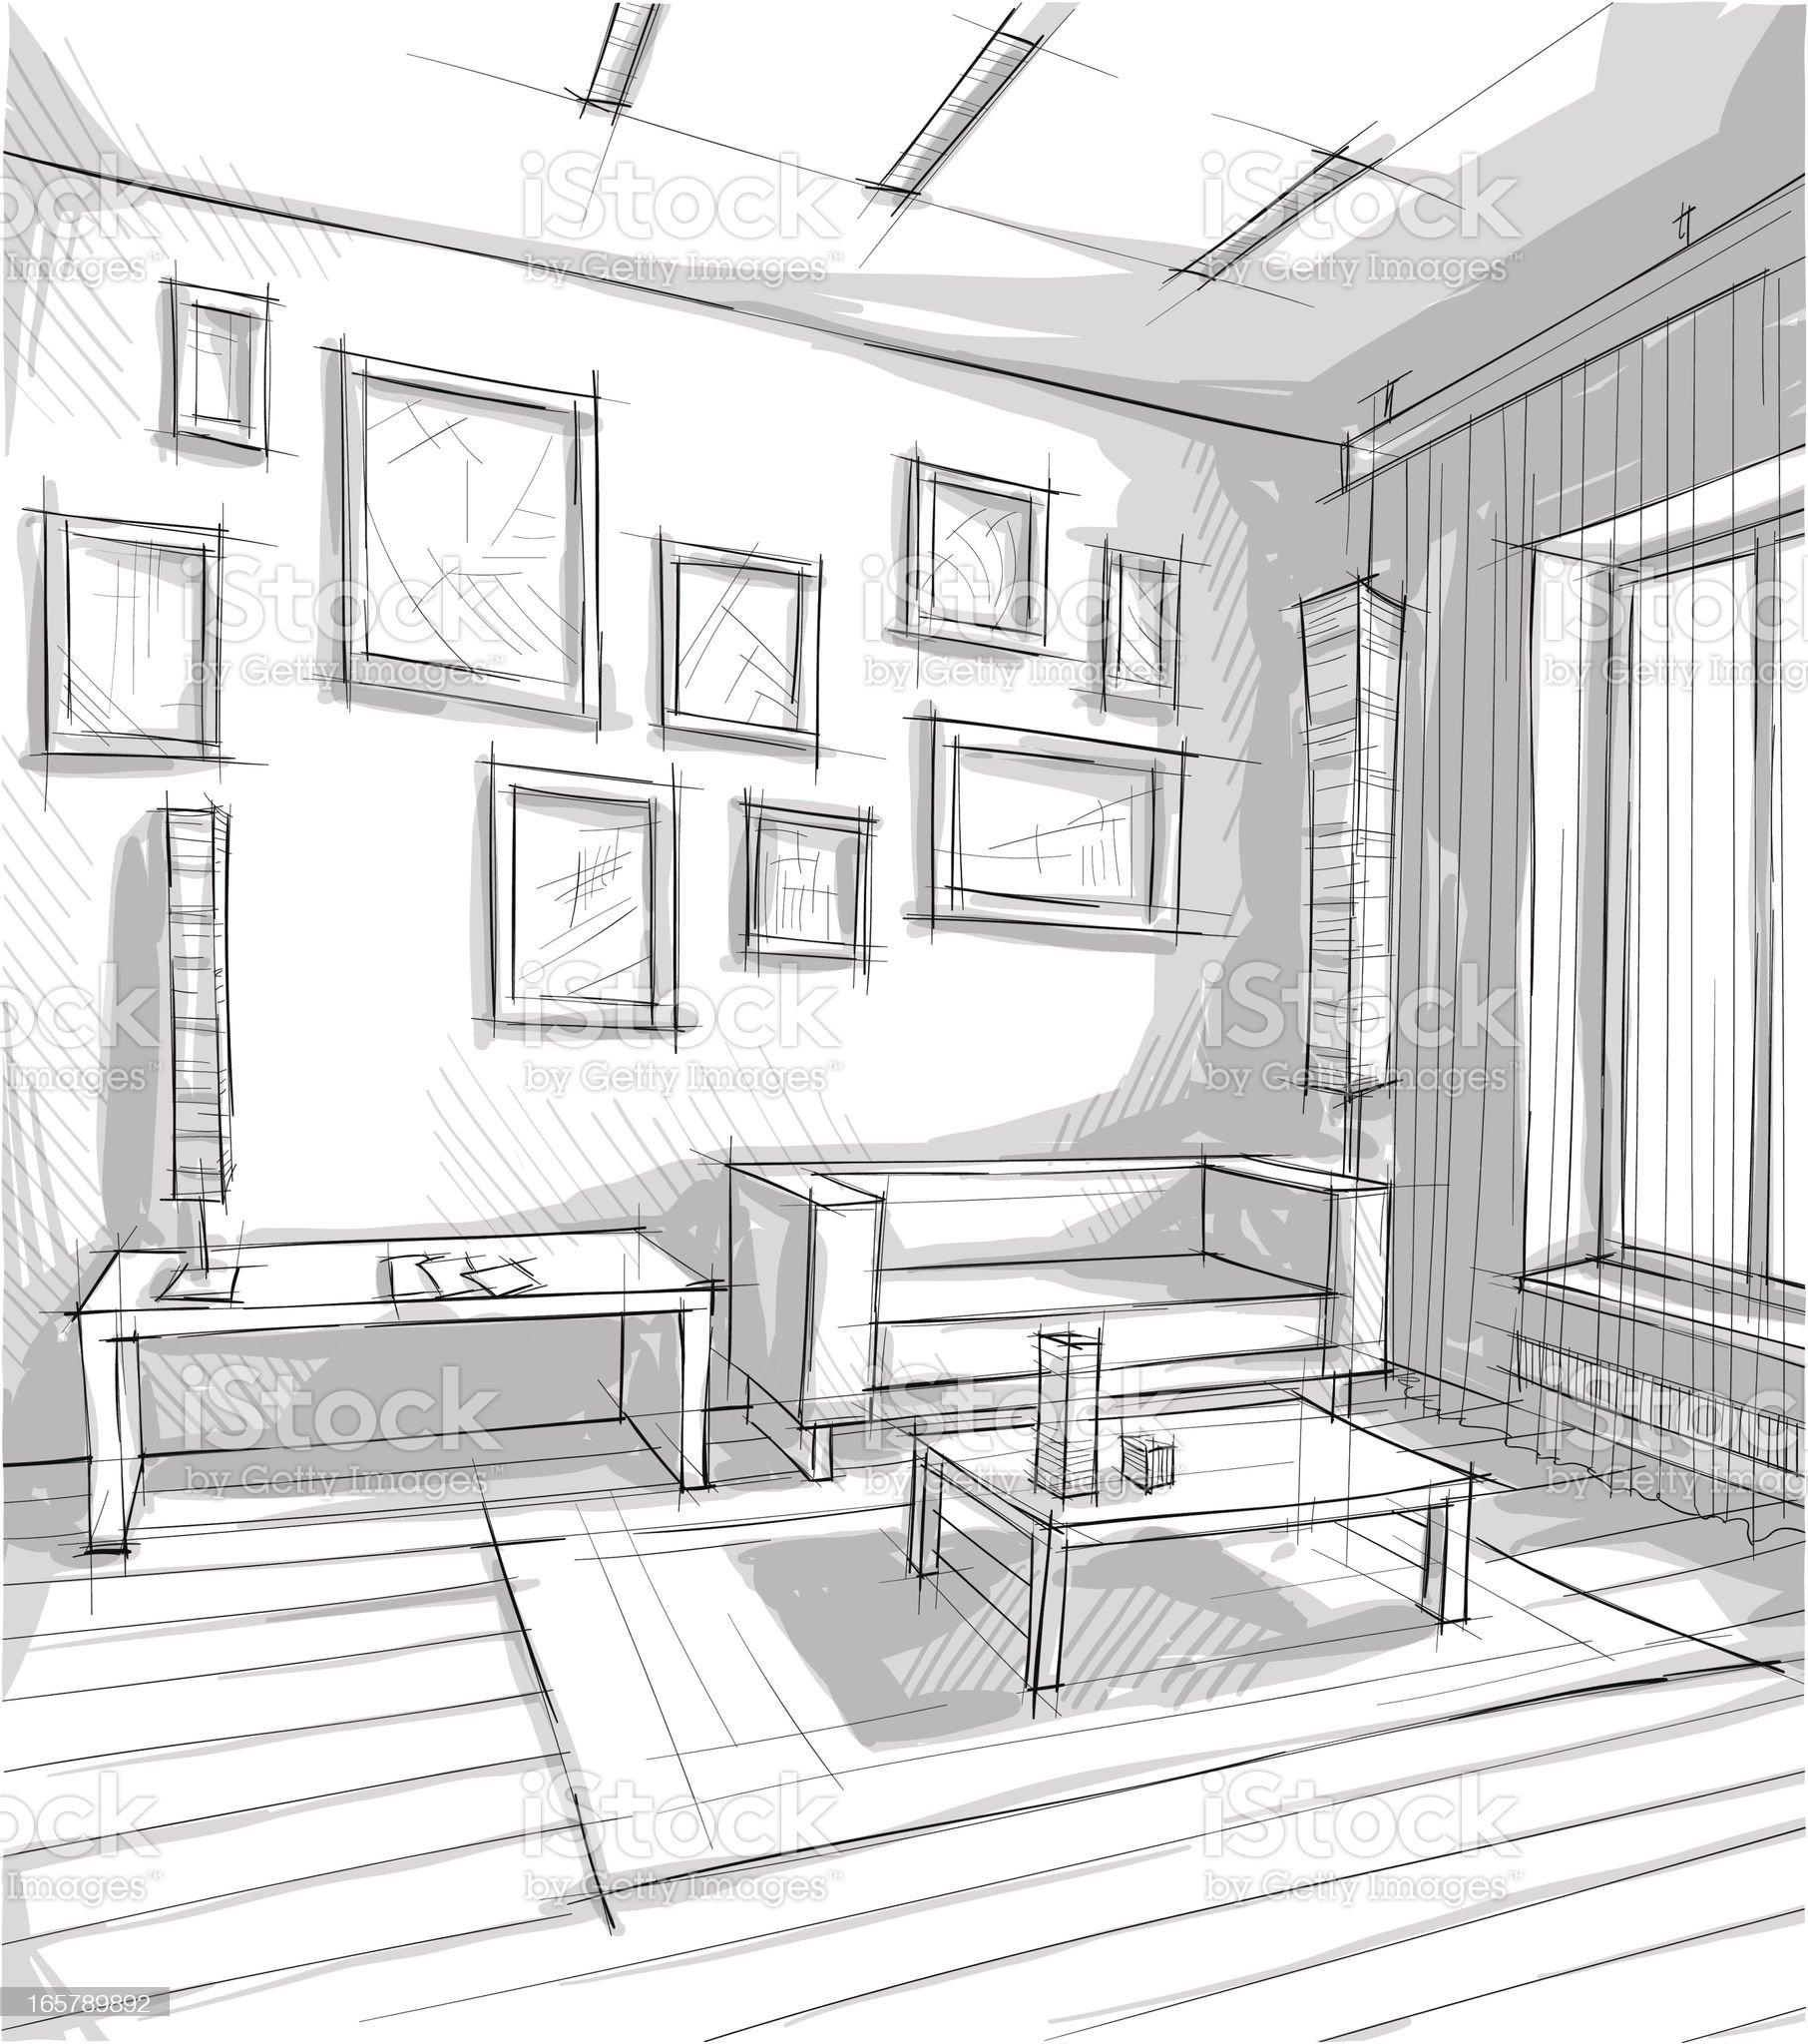 design royalty-free stock vector art